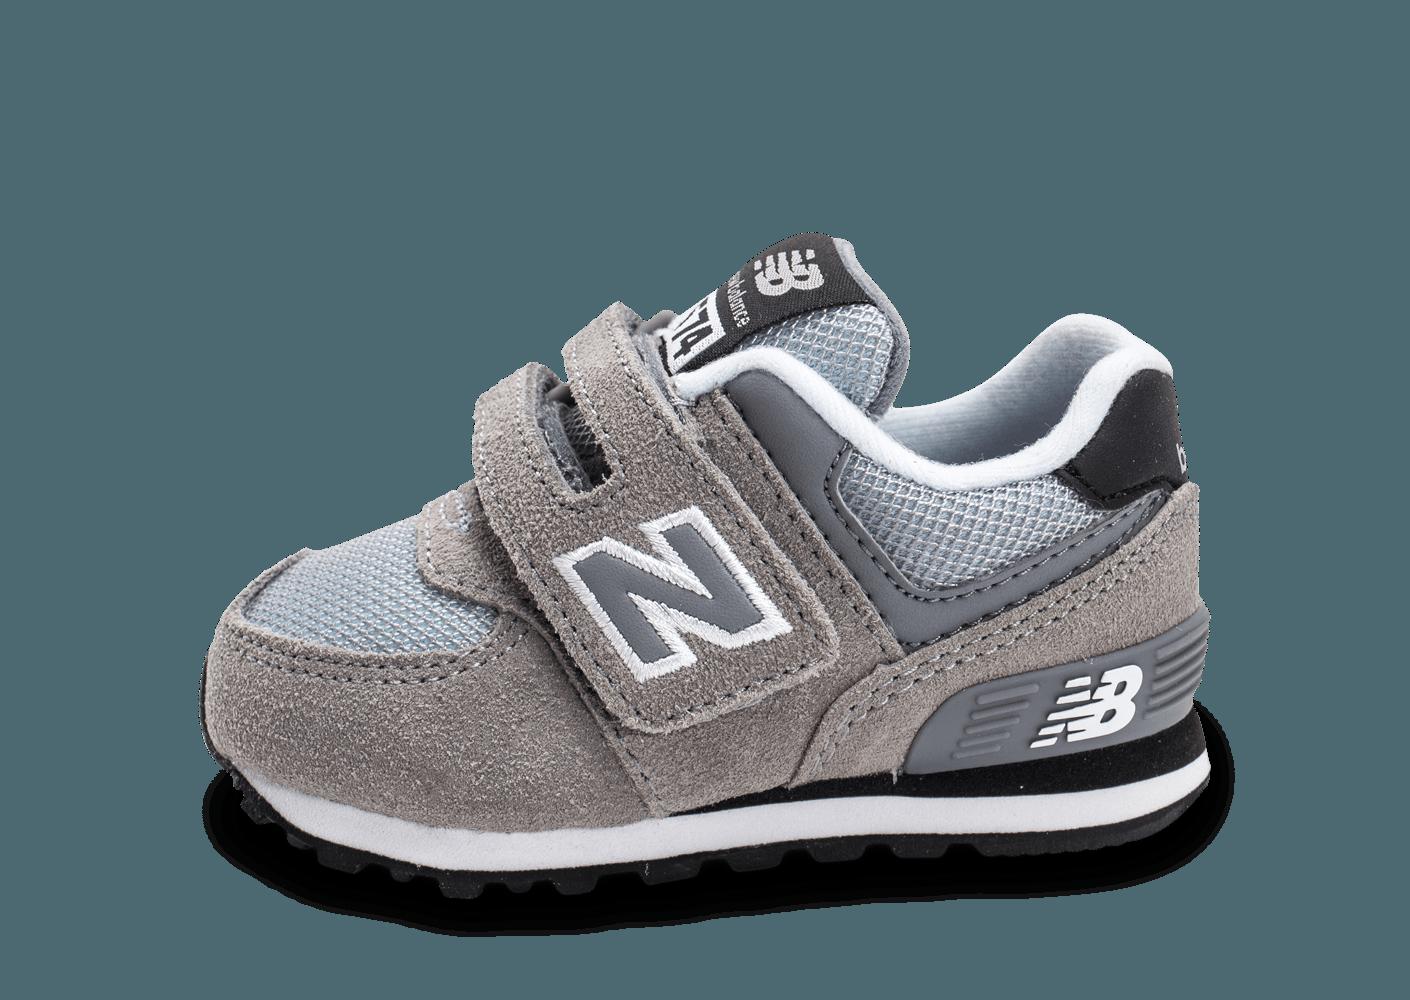 b851a356f5d92 ... Chaussures enfant New balance  basket bébé ...